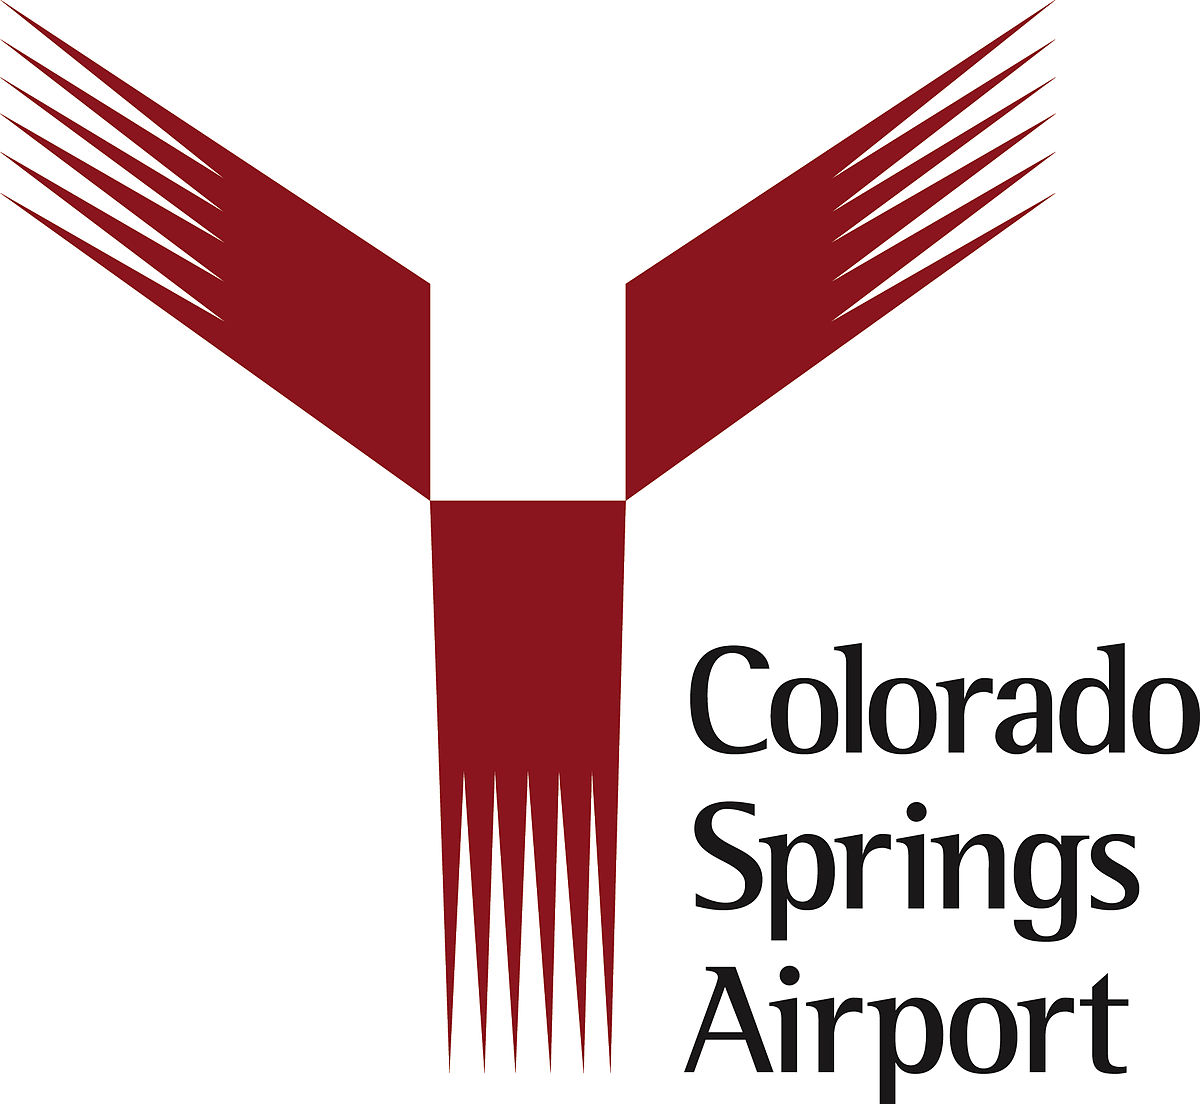 Colorado Springs Airport Enterprise Car Rental